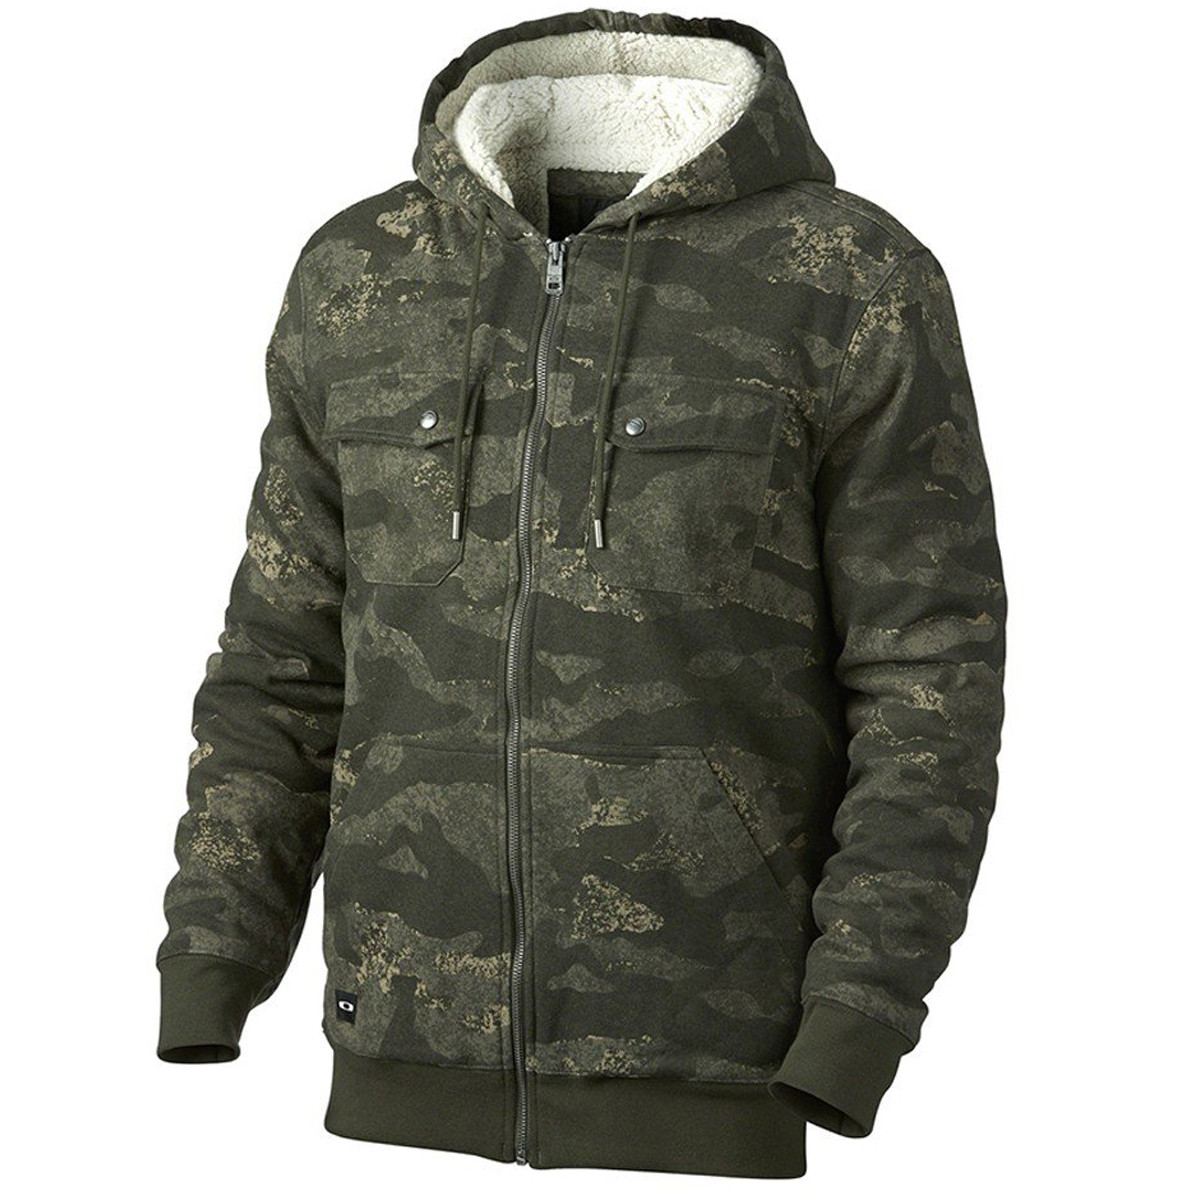 Moletom Oakley Agent Hoodie Fleece Camuflado Verde d98b1f6016